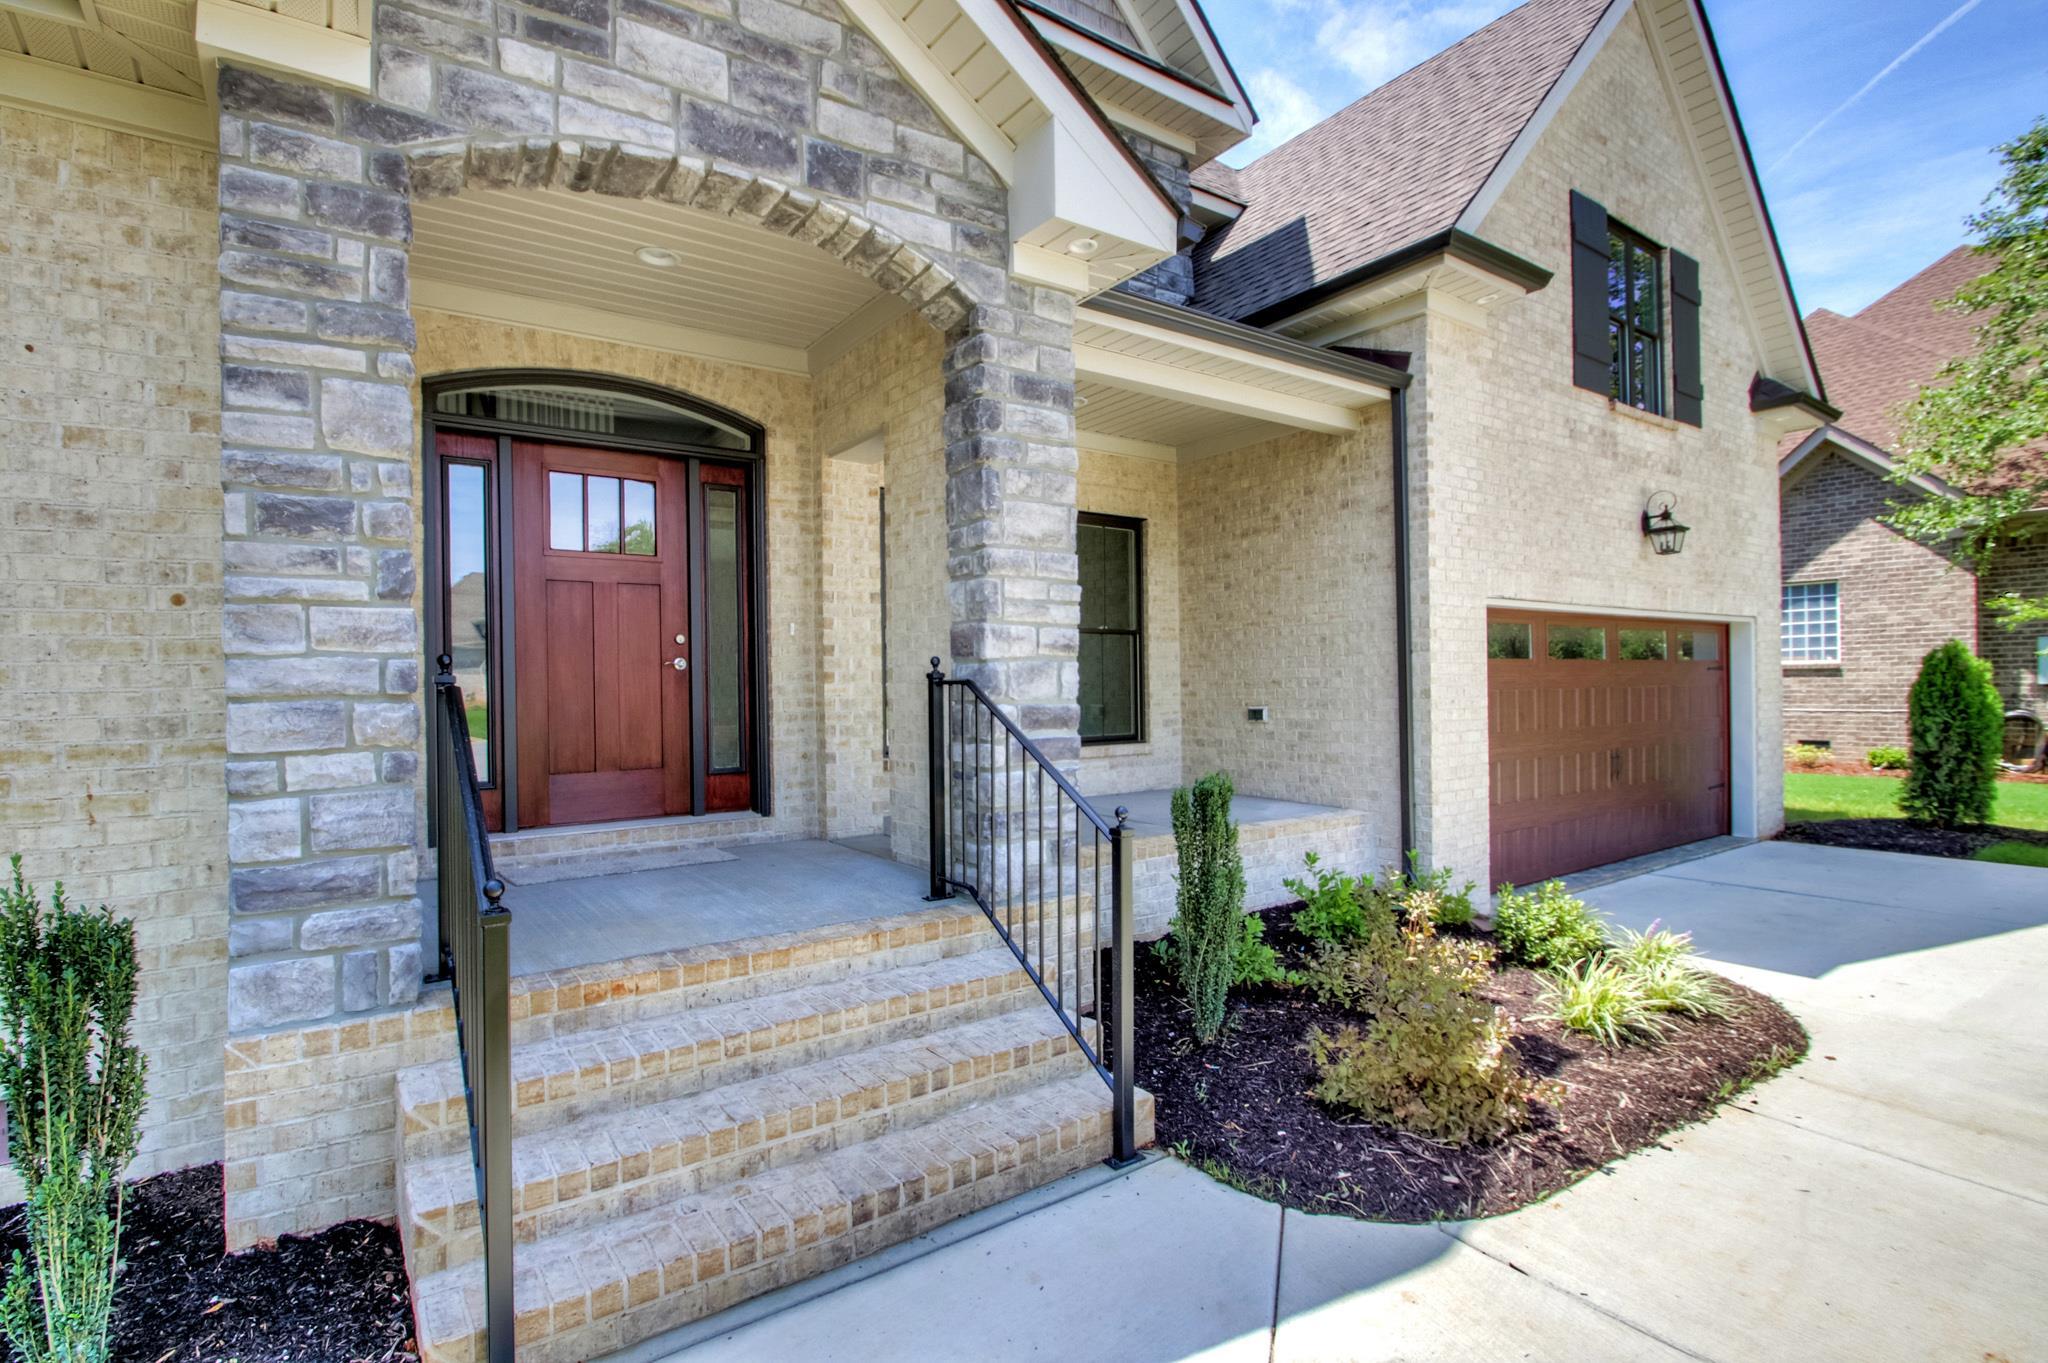 450 Paul Norman Dr, Murfreesboro, TN 37128 - Murfreesboro, TN real estate listing